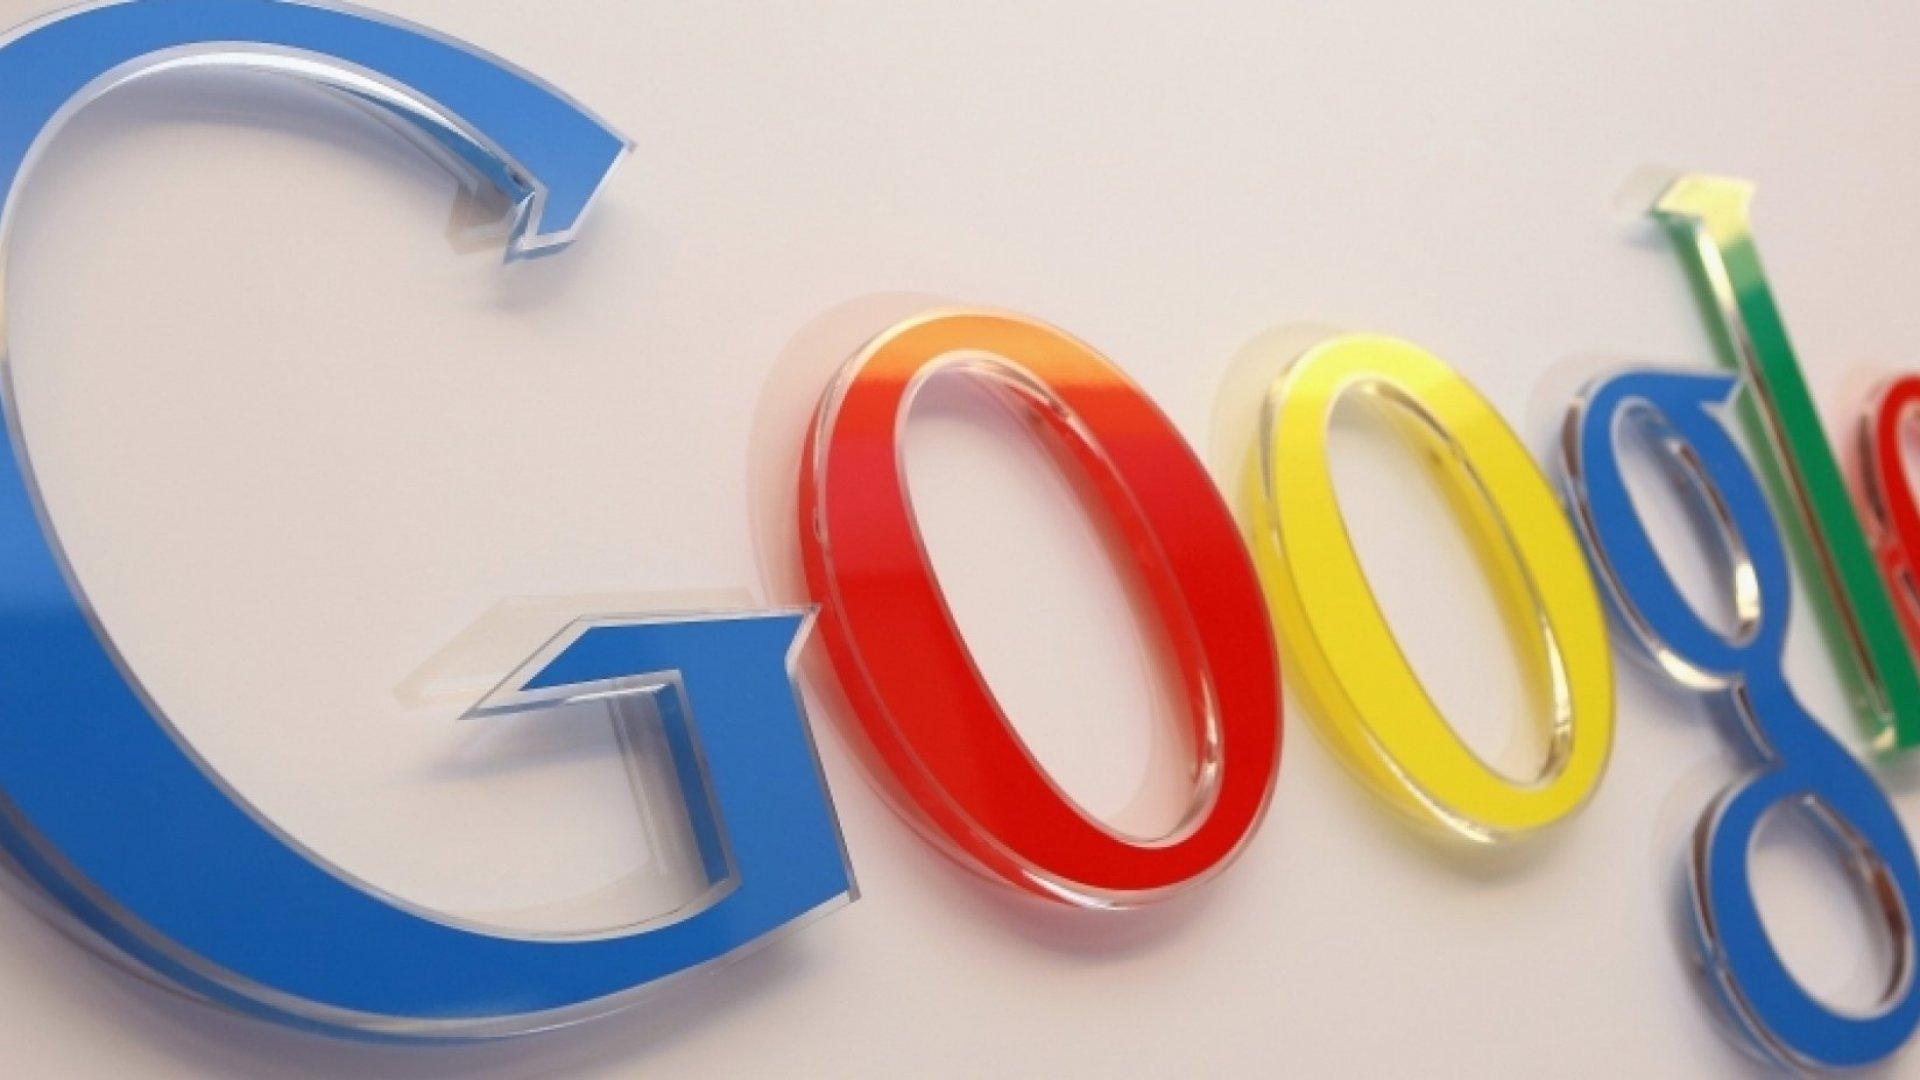 Google's Most Important Asset Could Surprise You